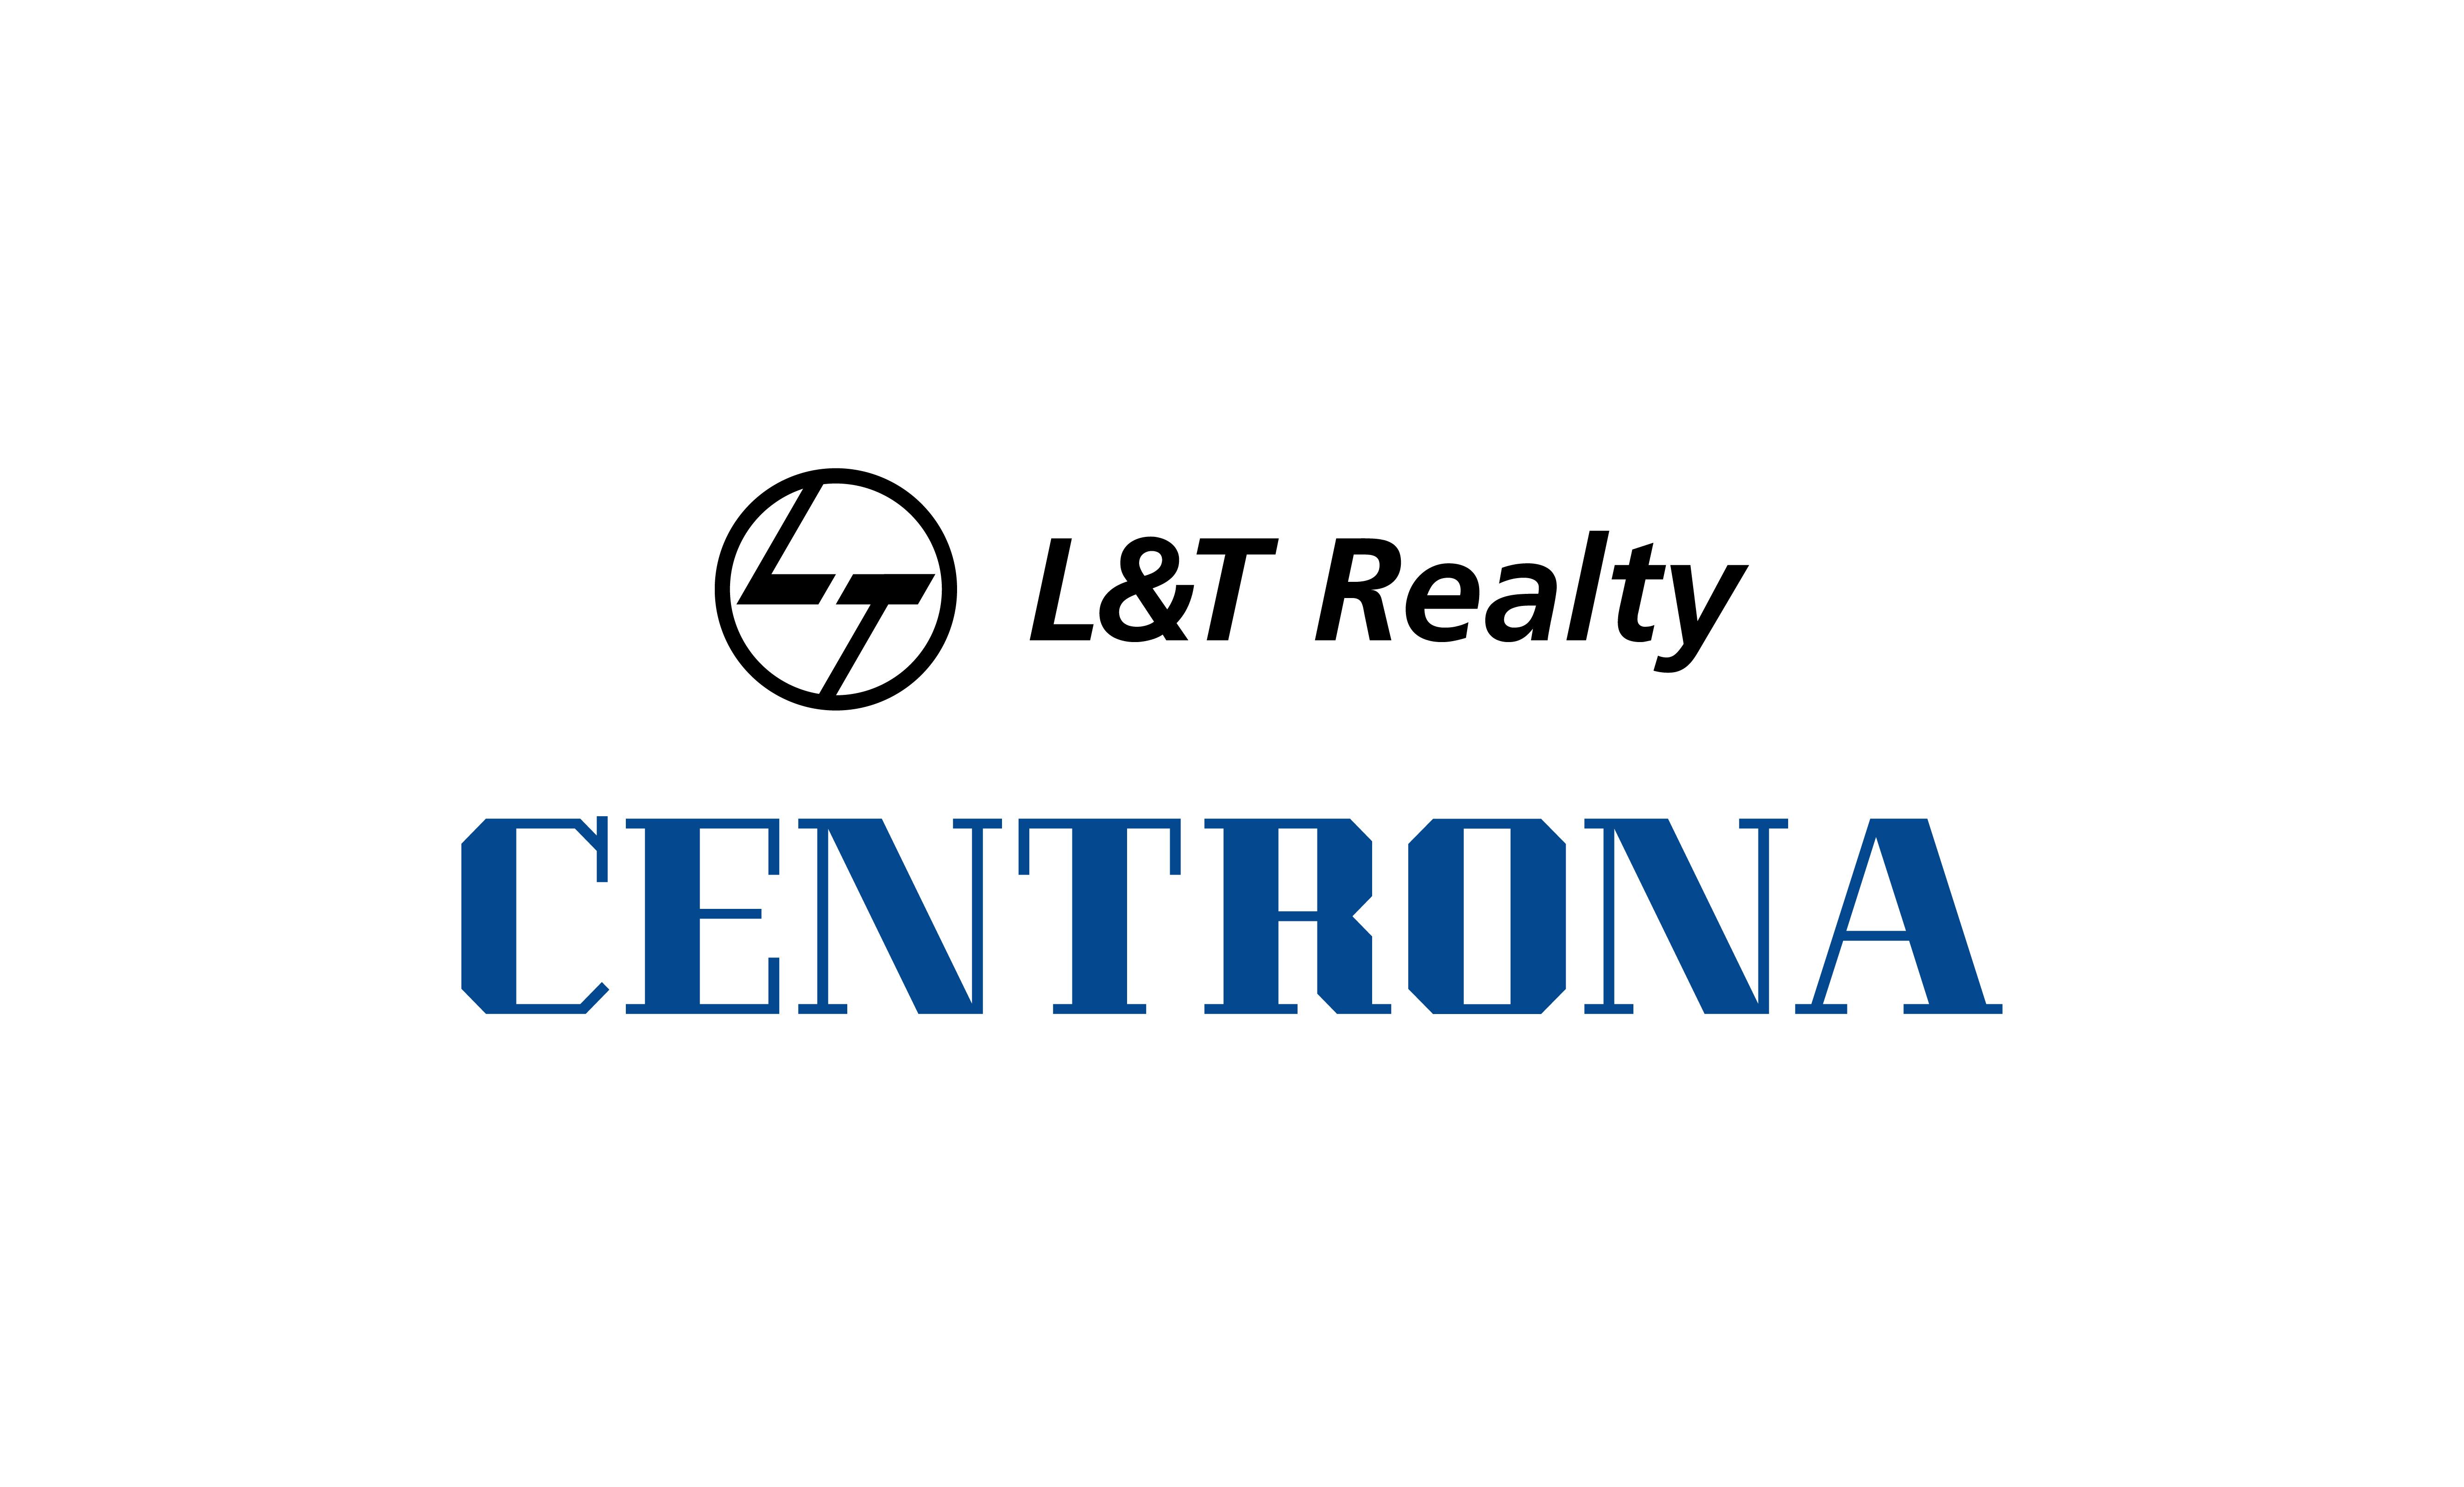 L and T Realty Centrona Central Mumbai suburbs